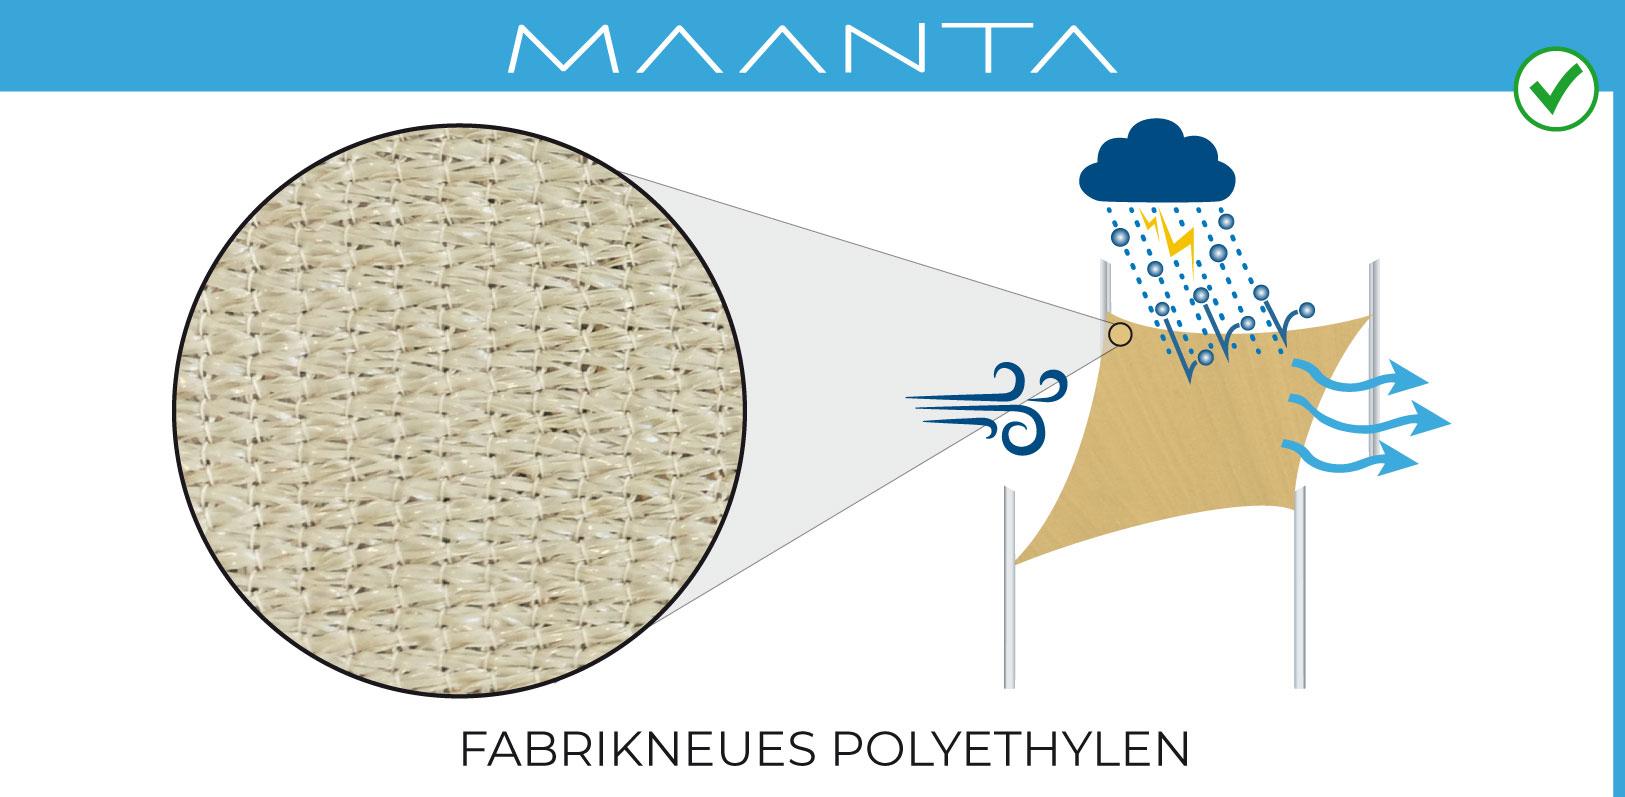 Sonnensegel farbiksneues Polyethylen